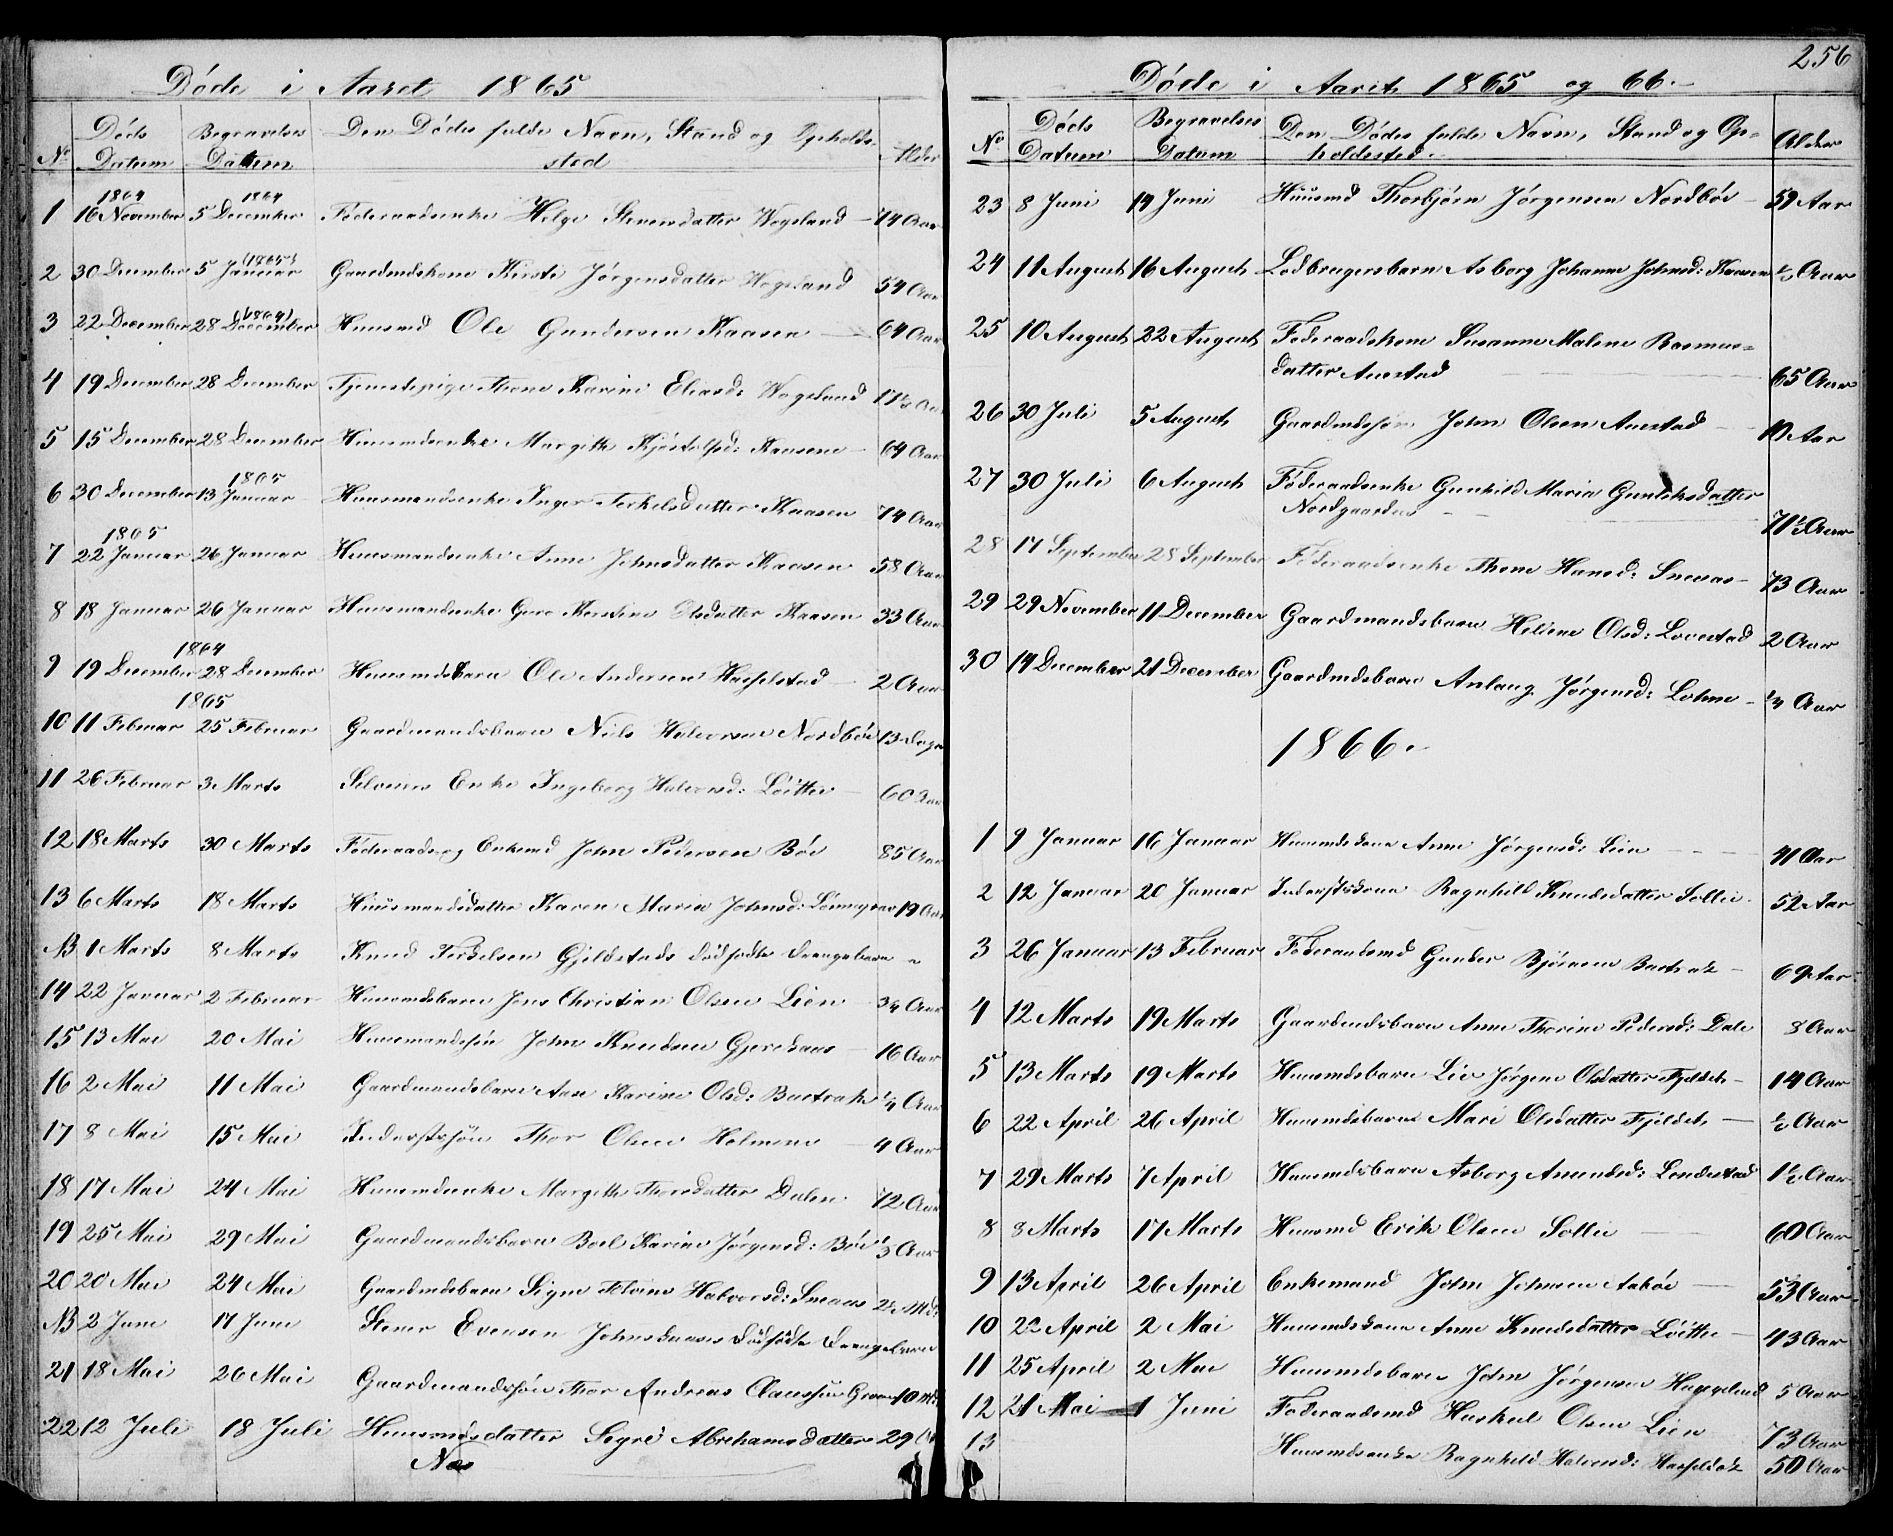 SAKO, Drangedal kirkebøker, G/Gb/L0001: Klokkerbok nr. II 1, 1856-1894, s. 256